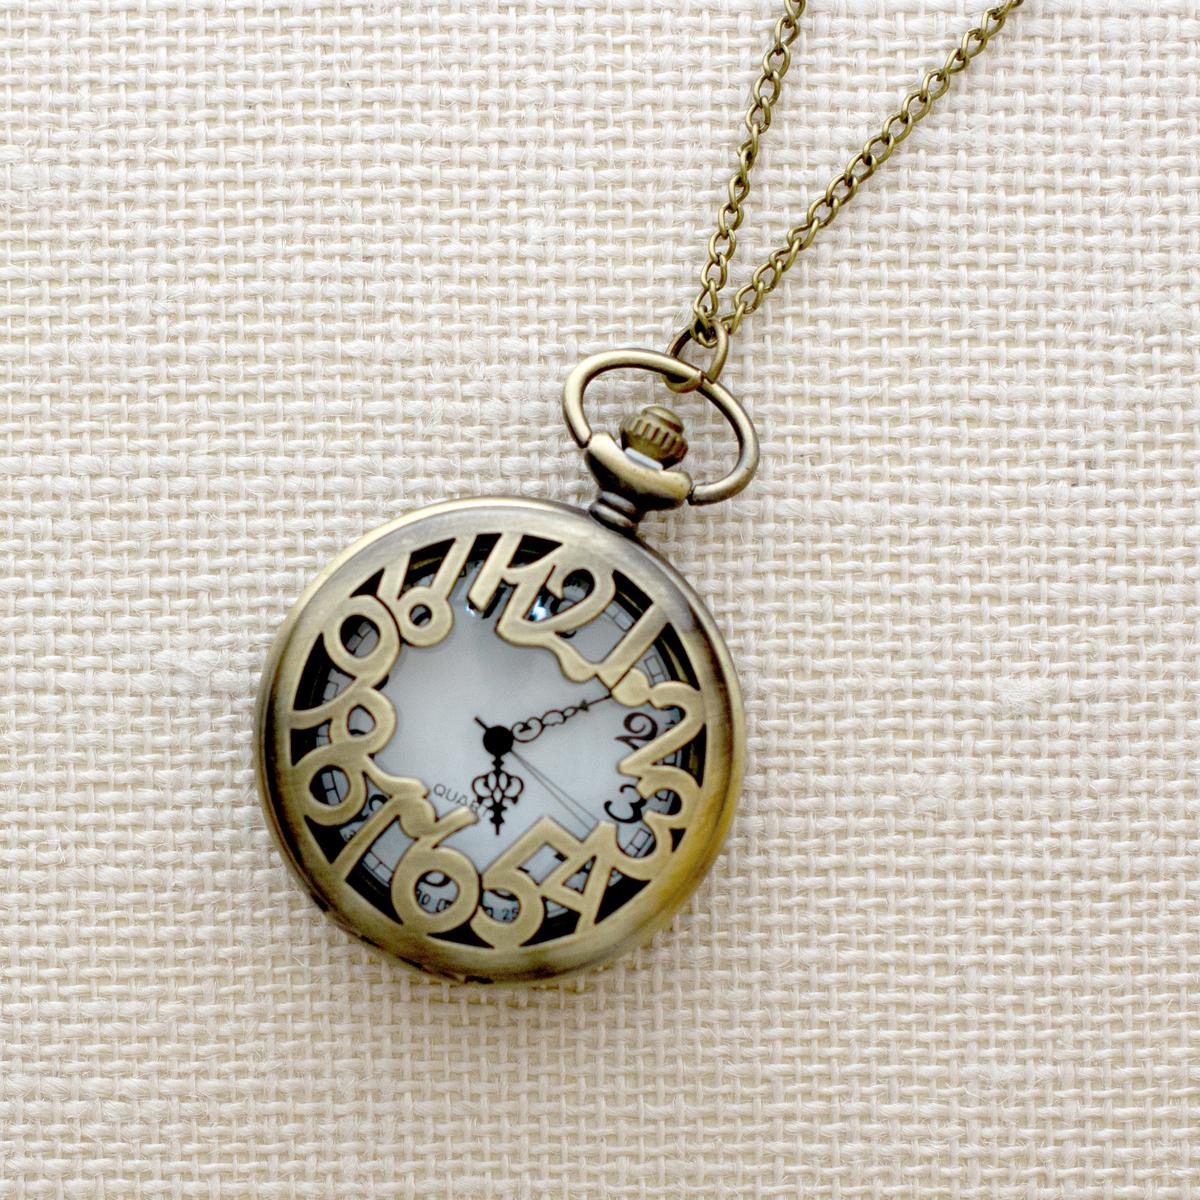 Кулон-часы Циферки (большой). ANTIK-131 ( ANTIK-131 )